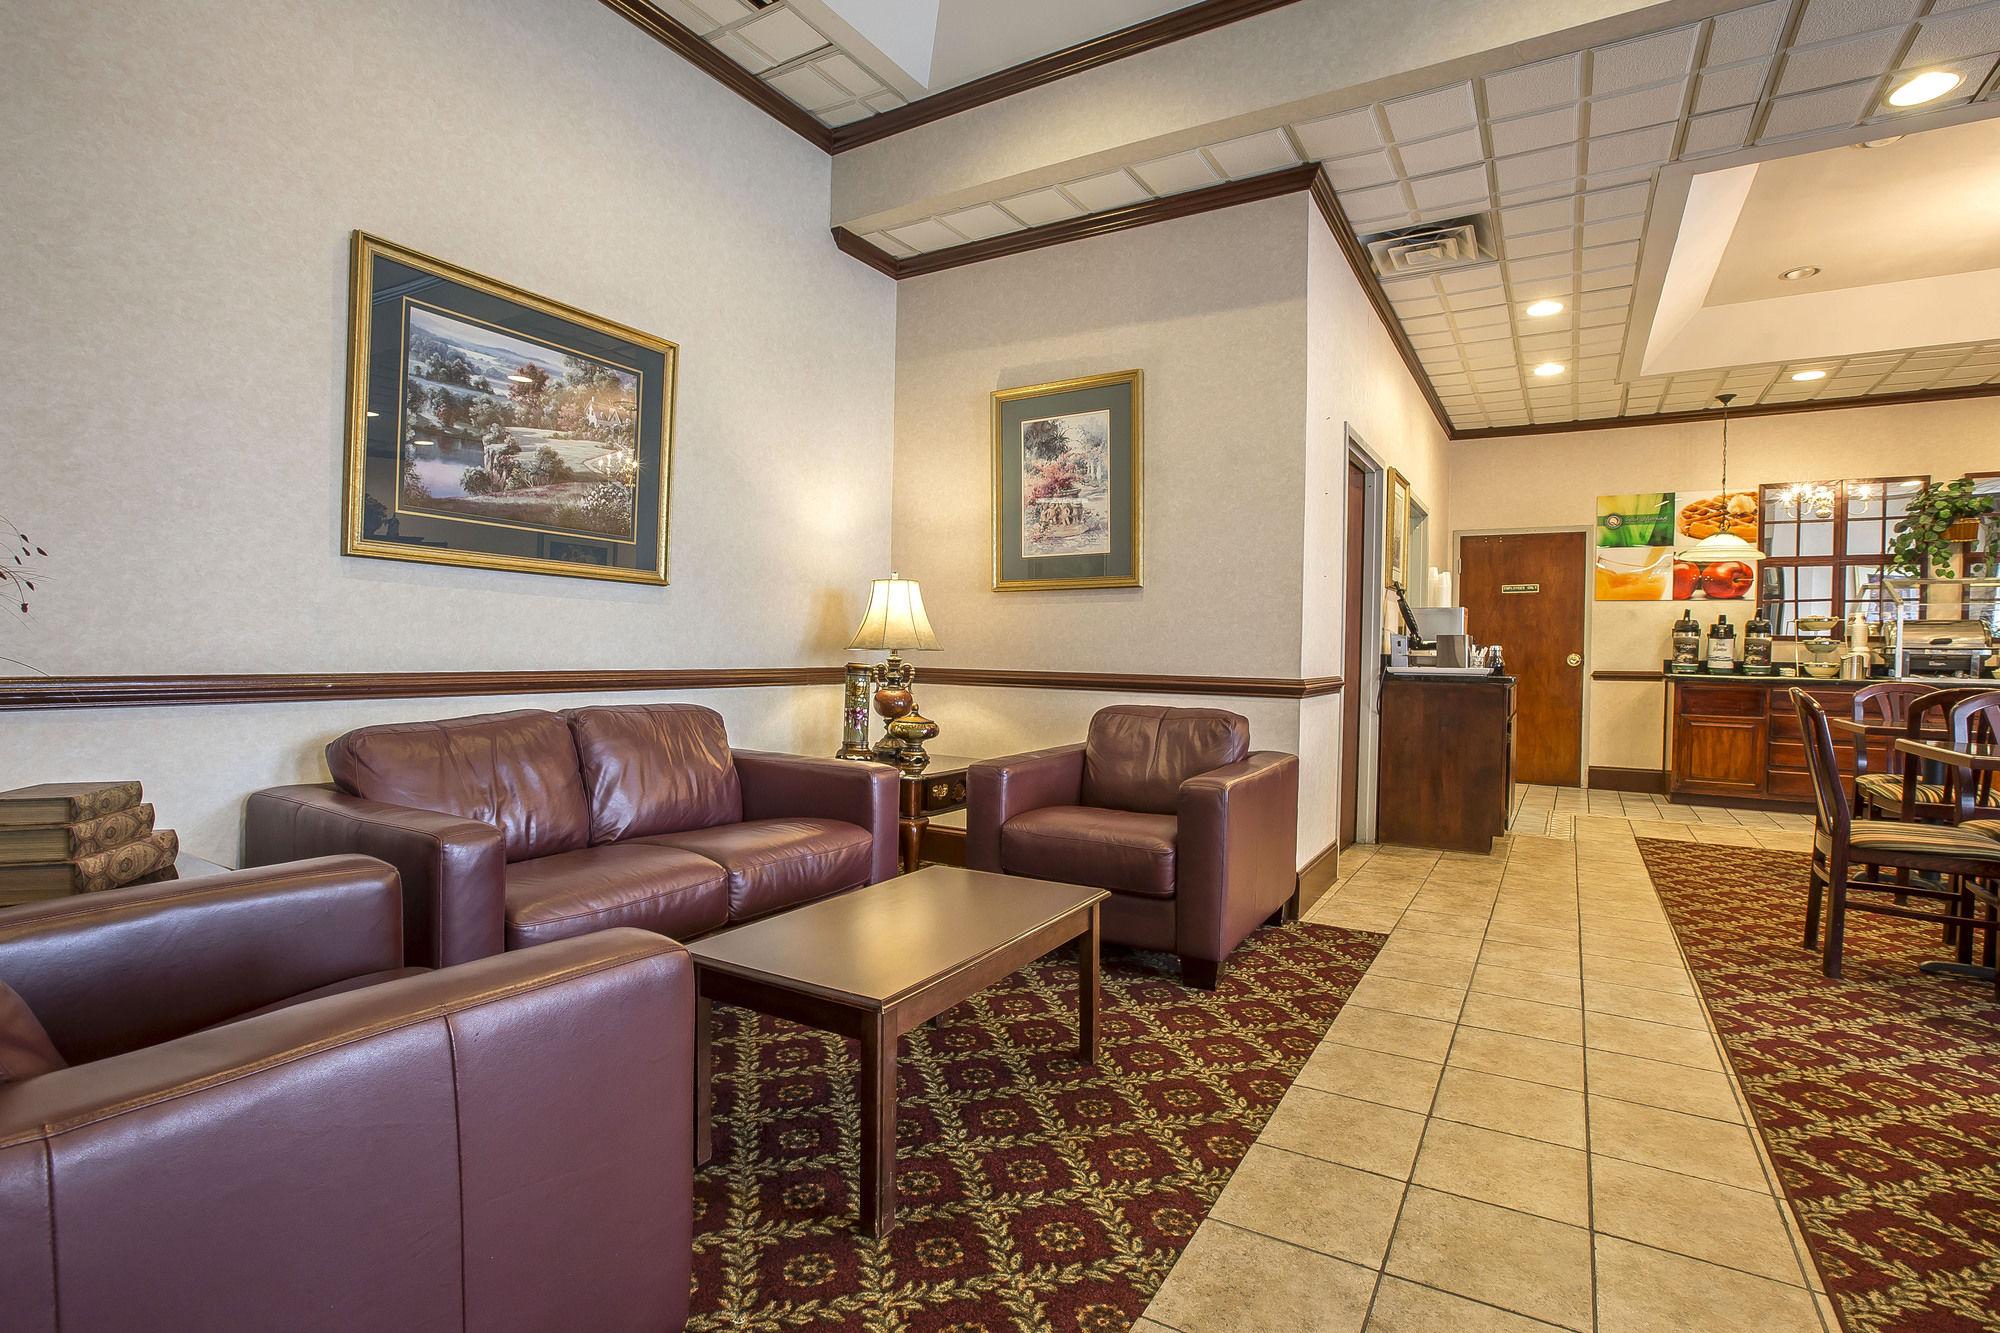 Quality Inn in Suwanee, GA